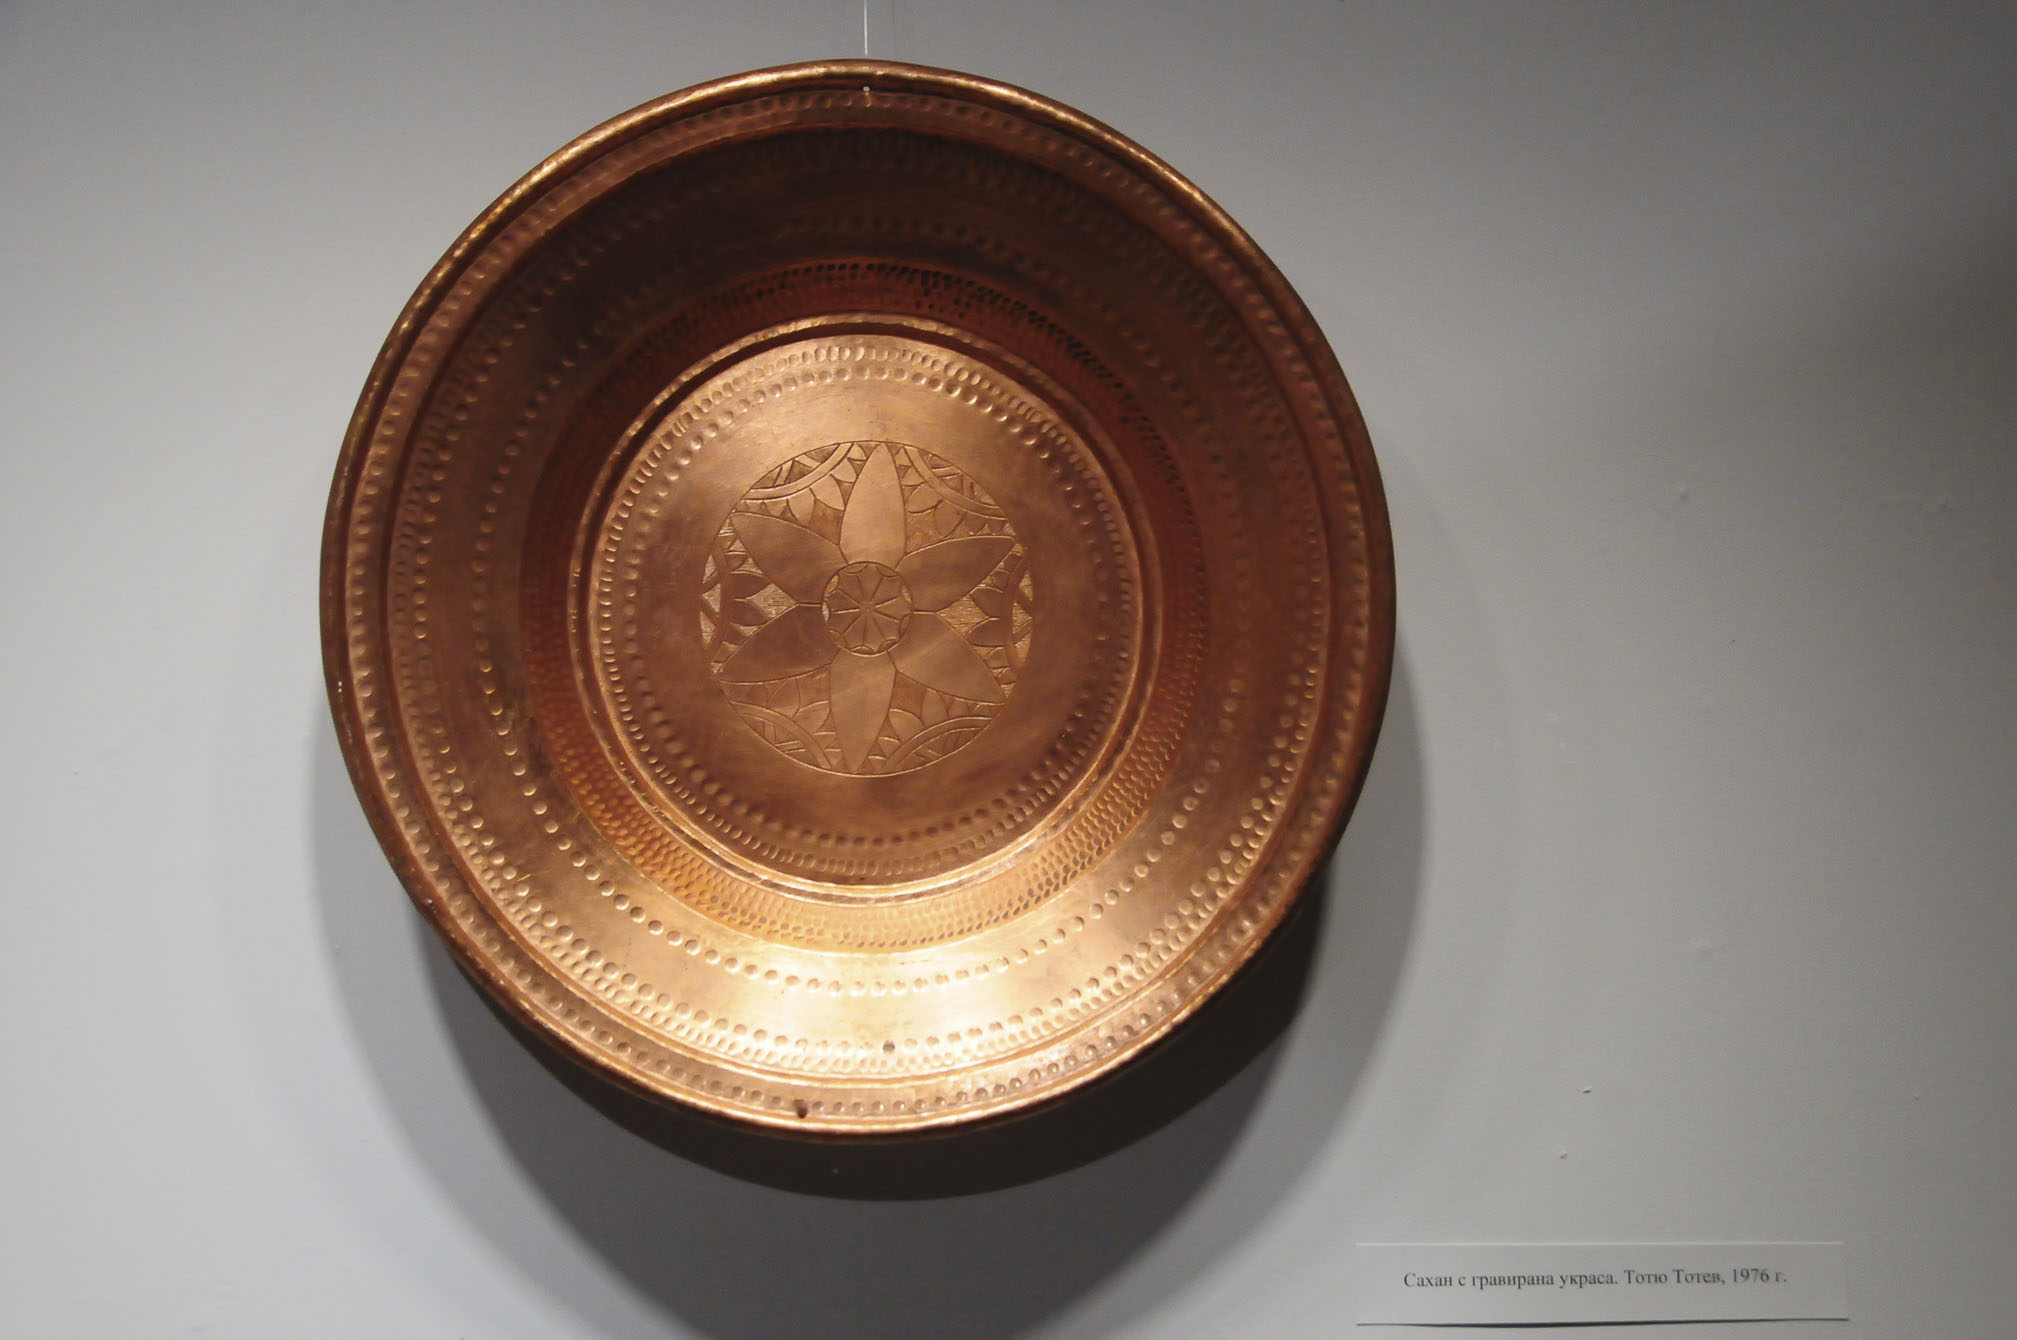 troyan-museum-mednikarstvo-ot-troyanskiq-krai-15